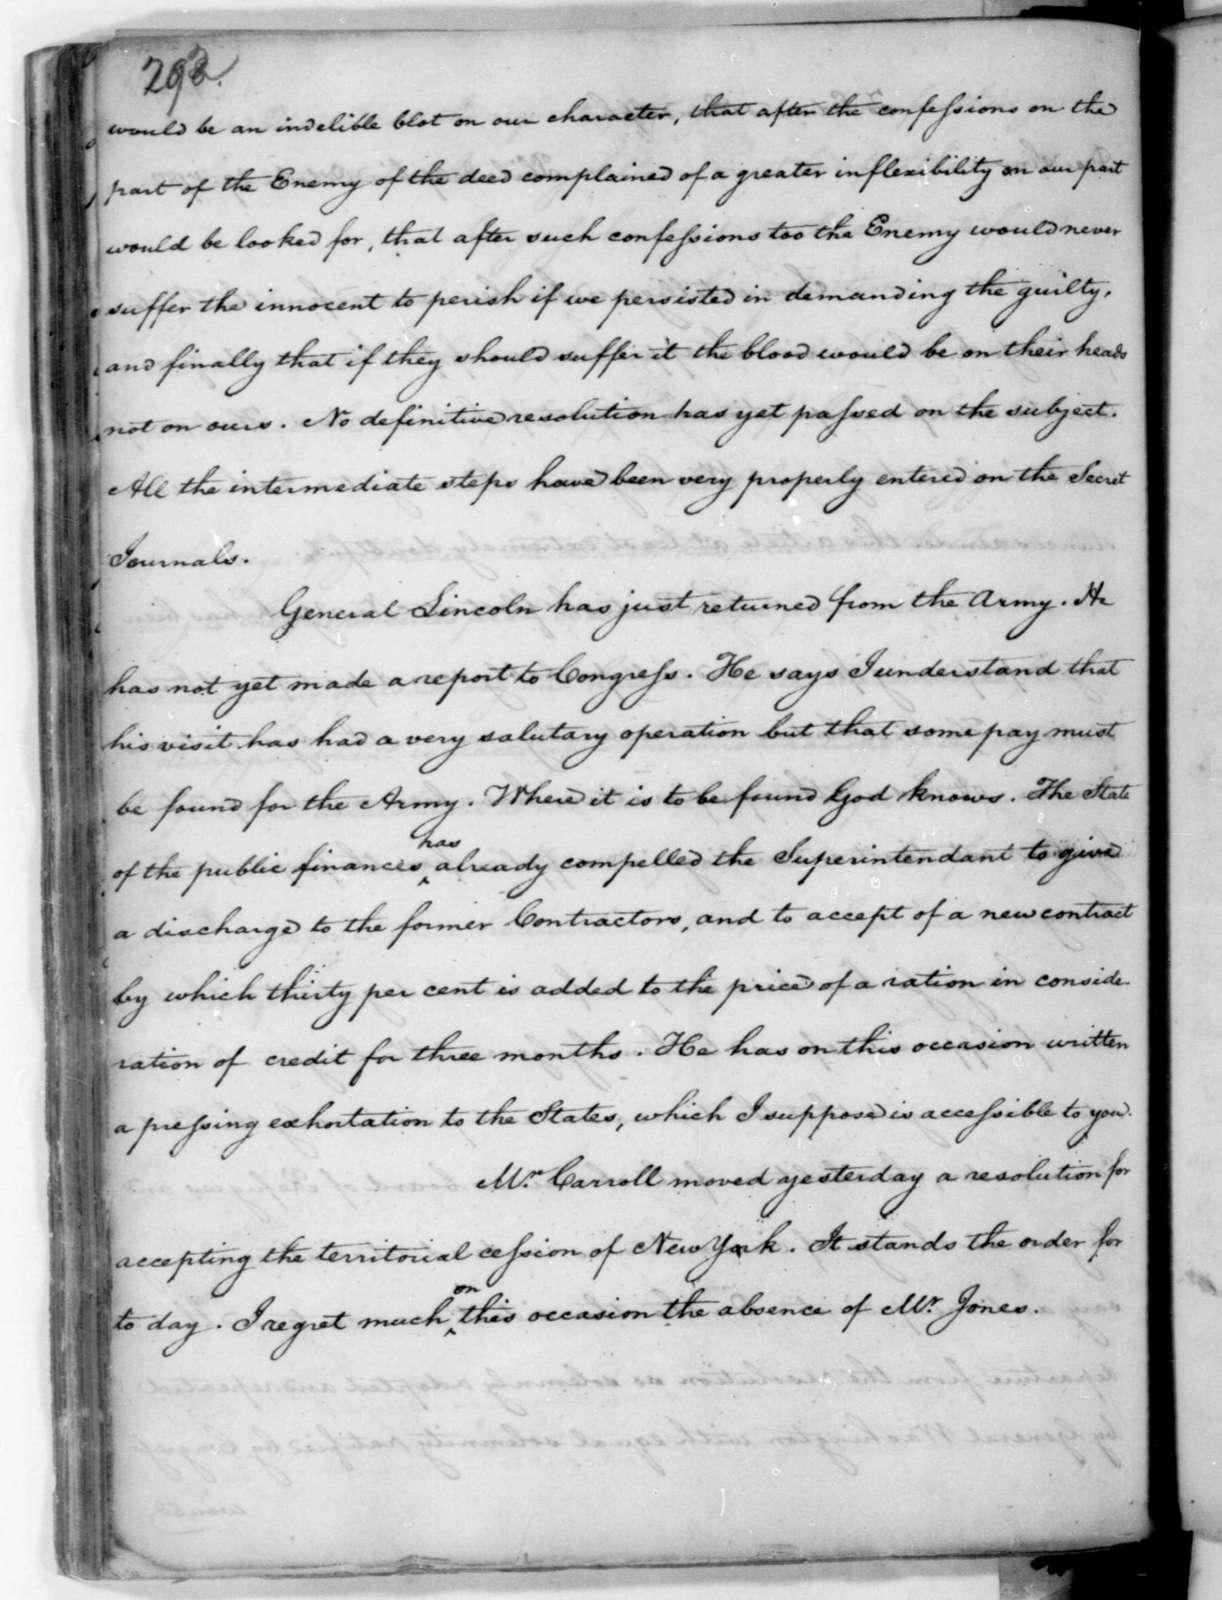 James Madison to Edmund Randolph, October 29, 1782.